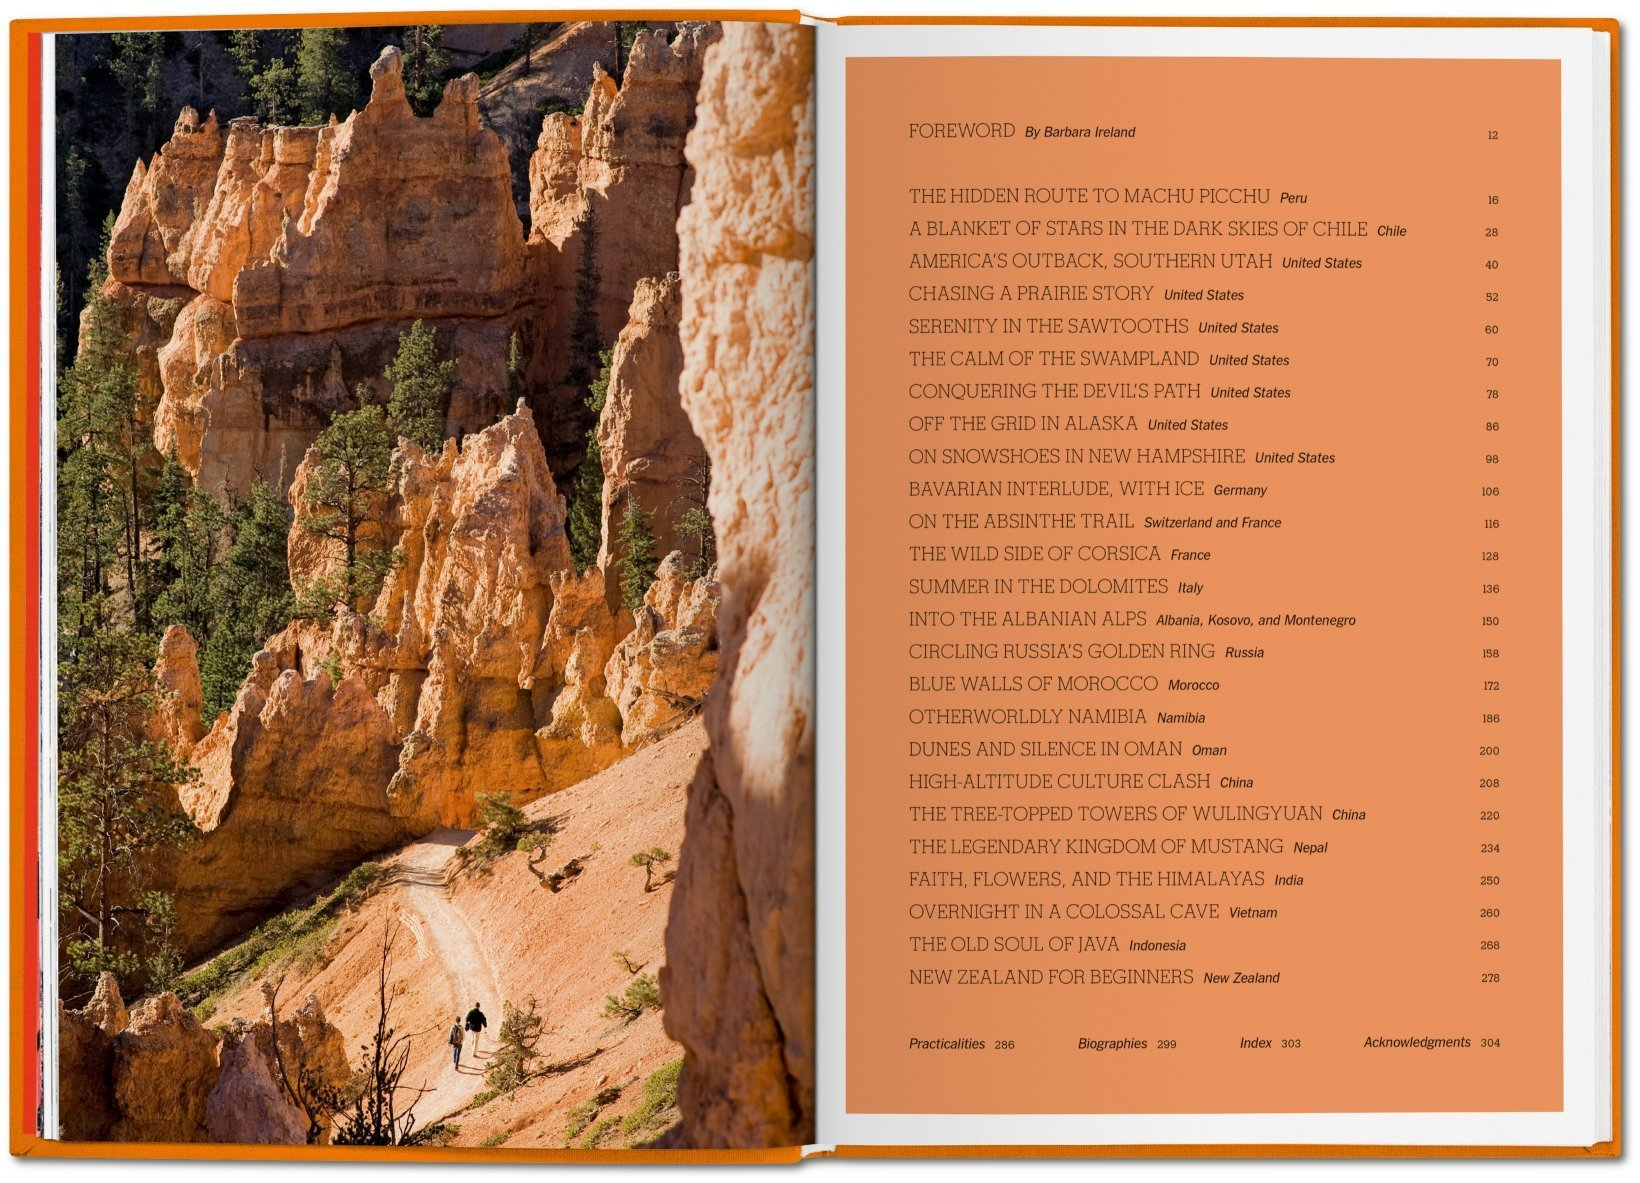 ju-nyt_explorer_mountains_deserts-image_04_08705.jpg